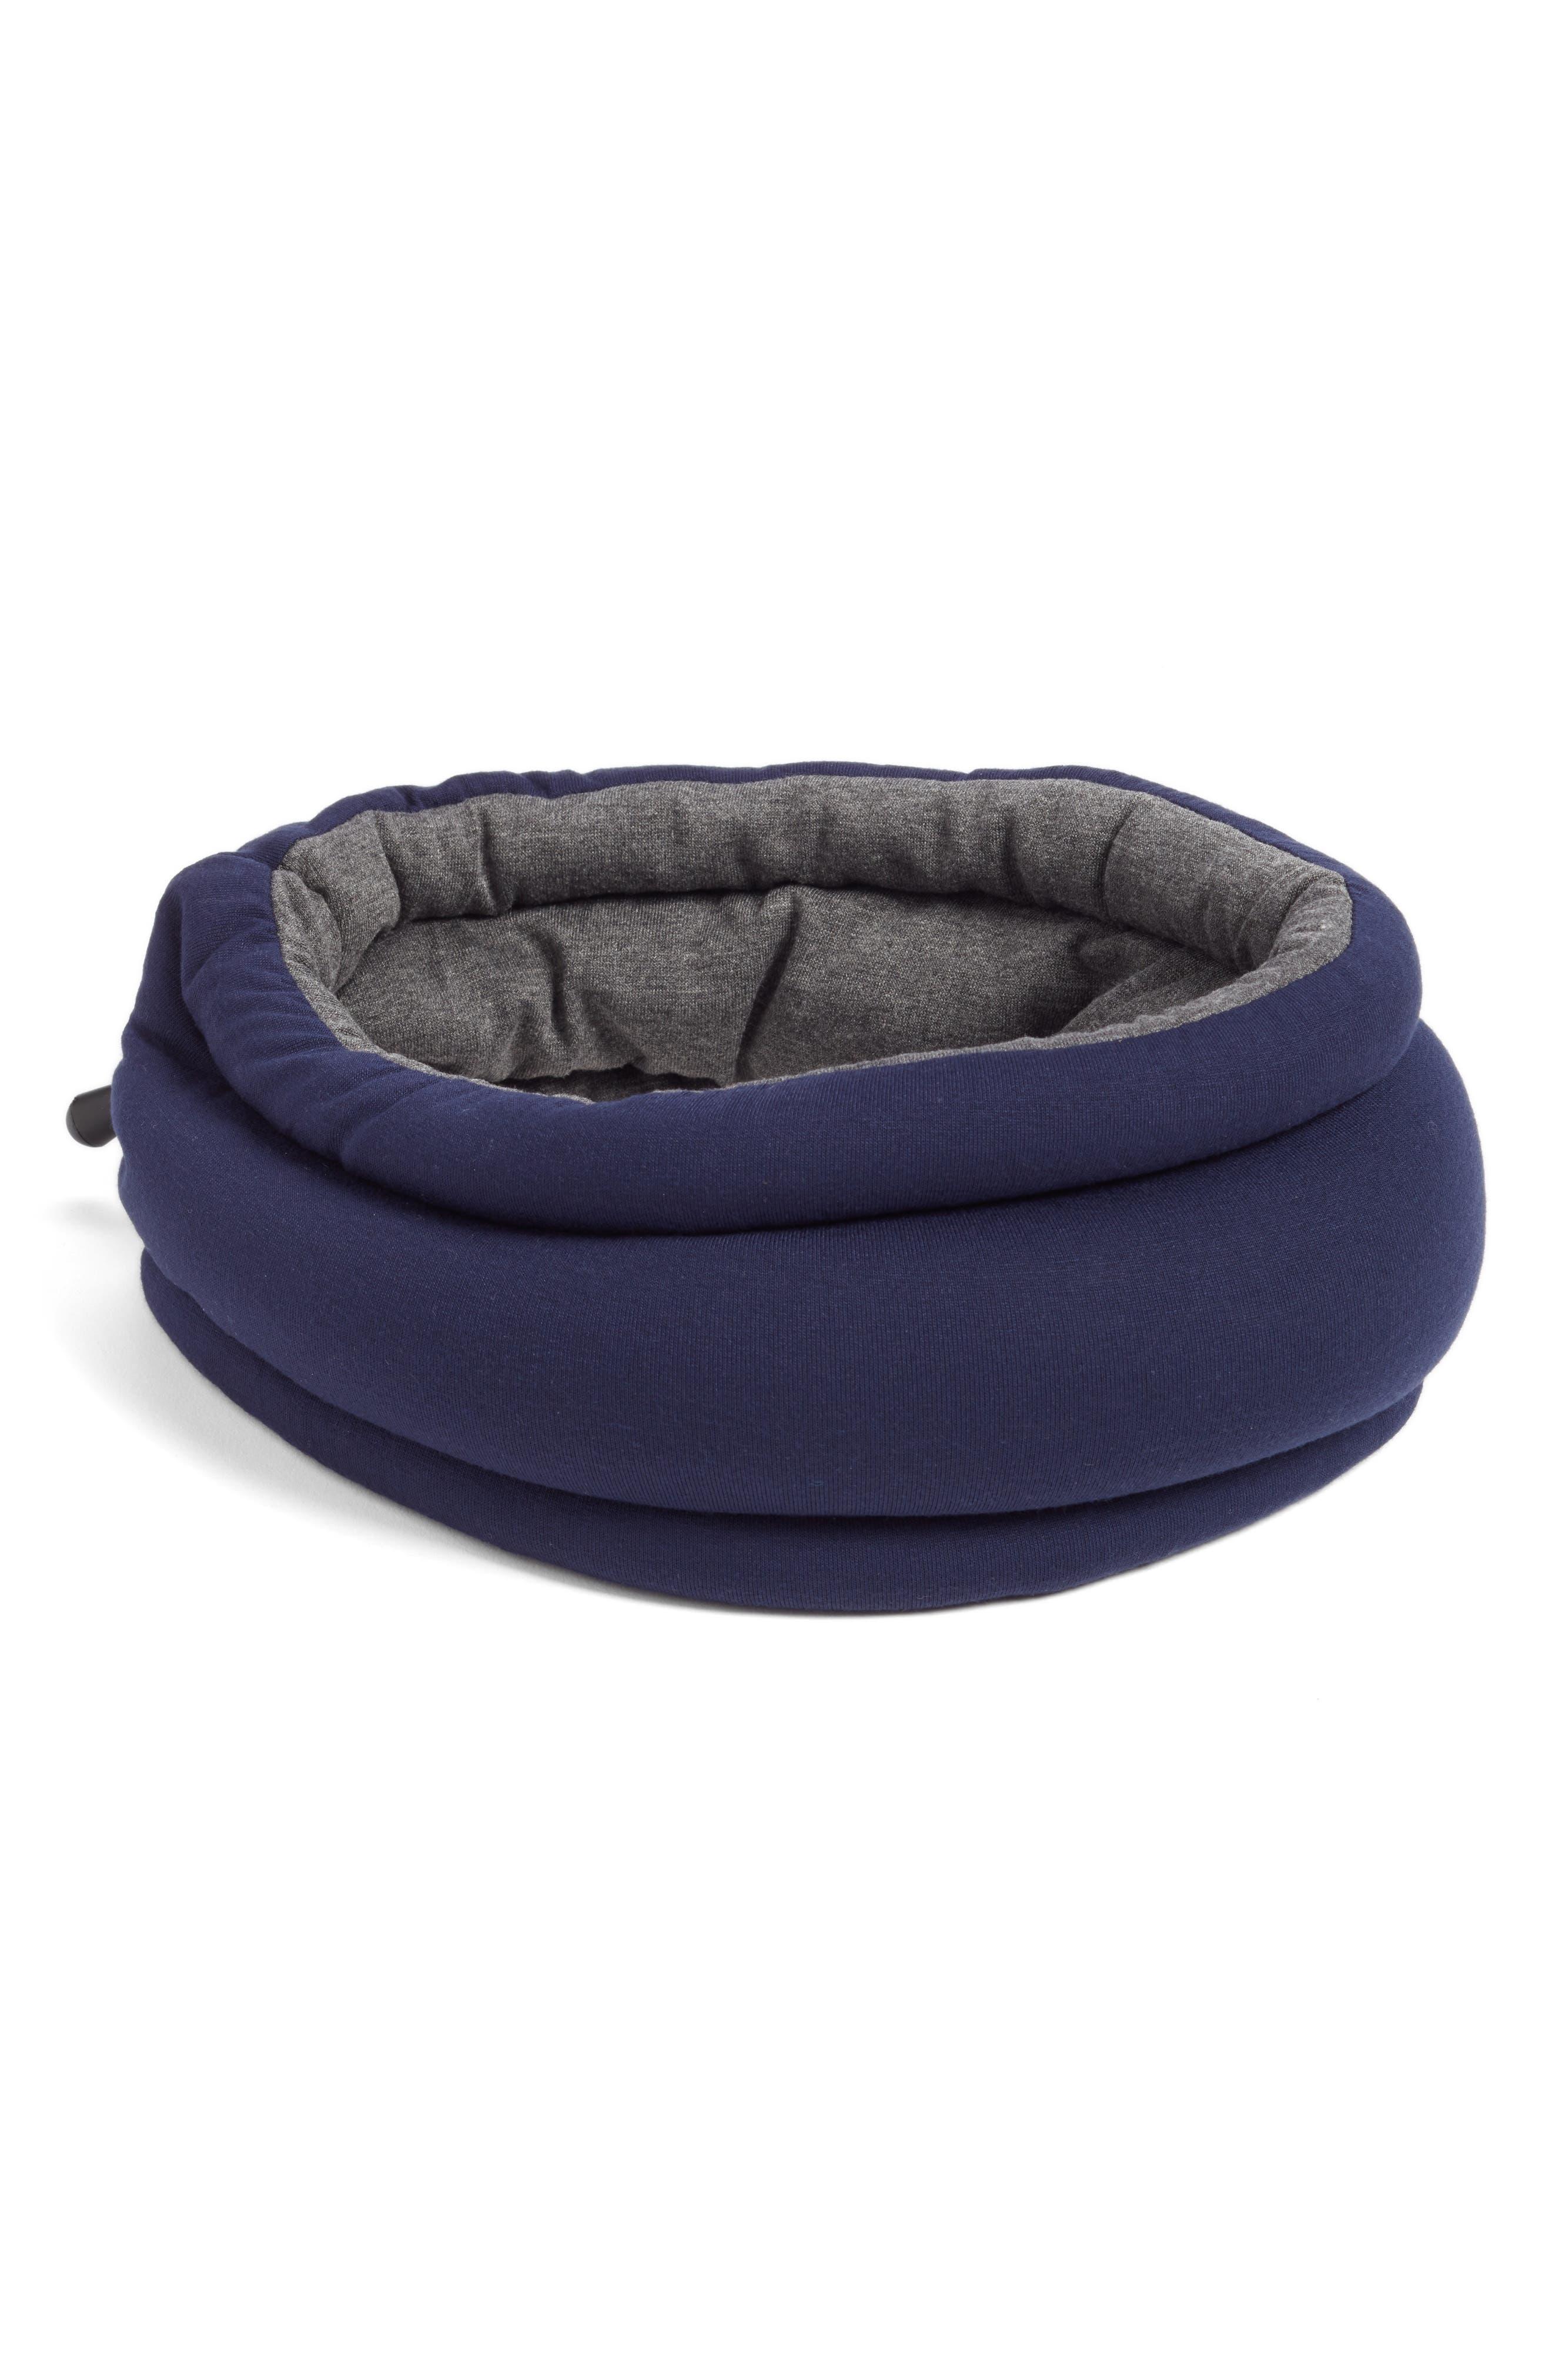 OSTRICHPILLOW<sup>®</sup> Light Reversible Travel Pillow,                         Main,                         color, MOONLIGHT BLUE